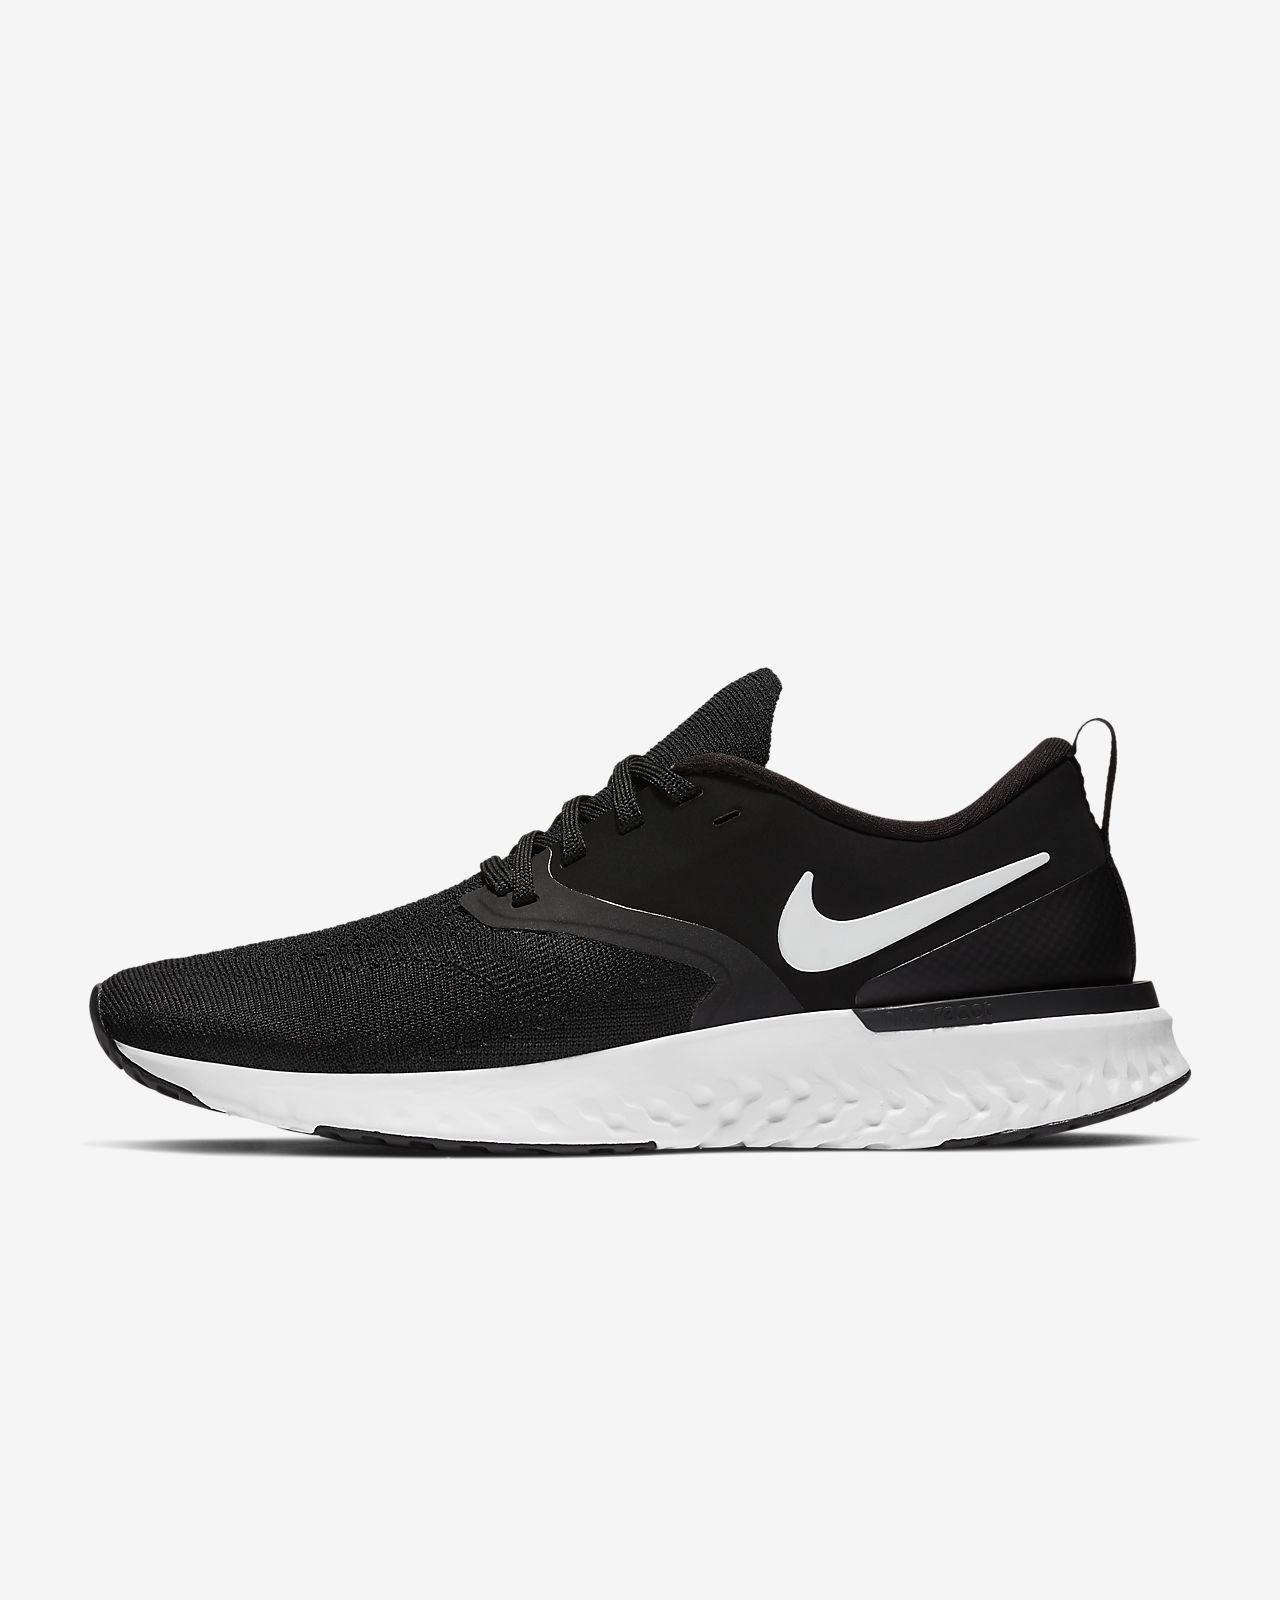 Sapatilhas de running Nike Odyssey React Flyknit 2 para mulher